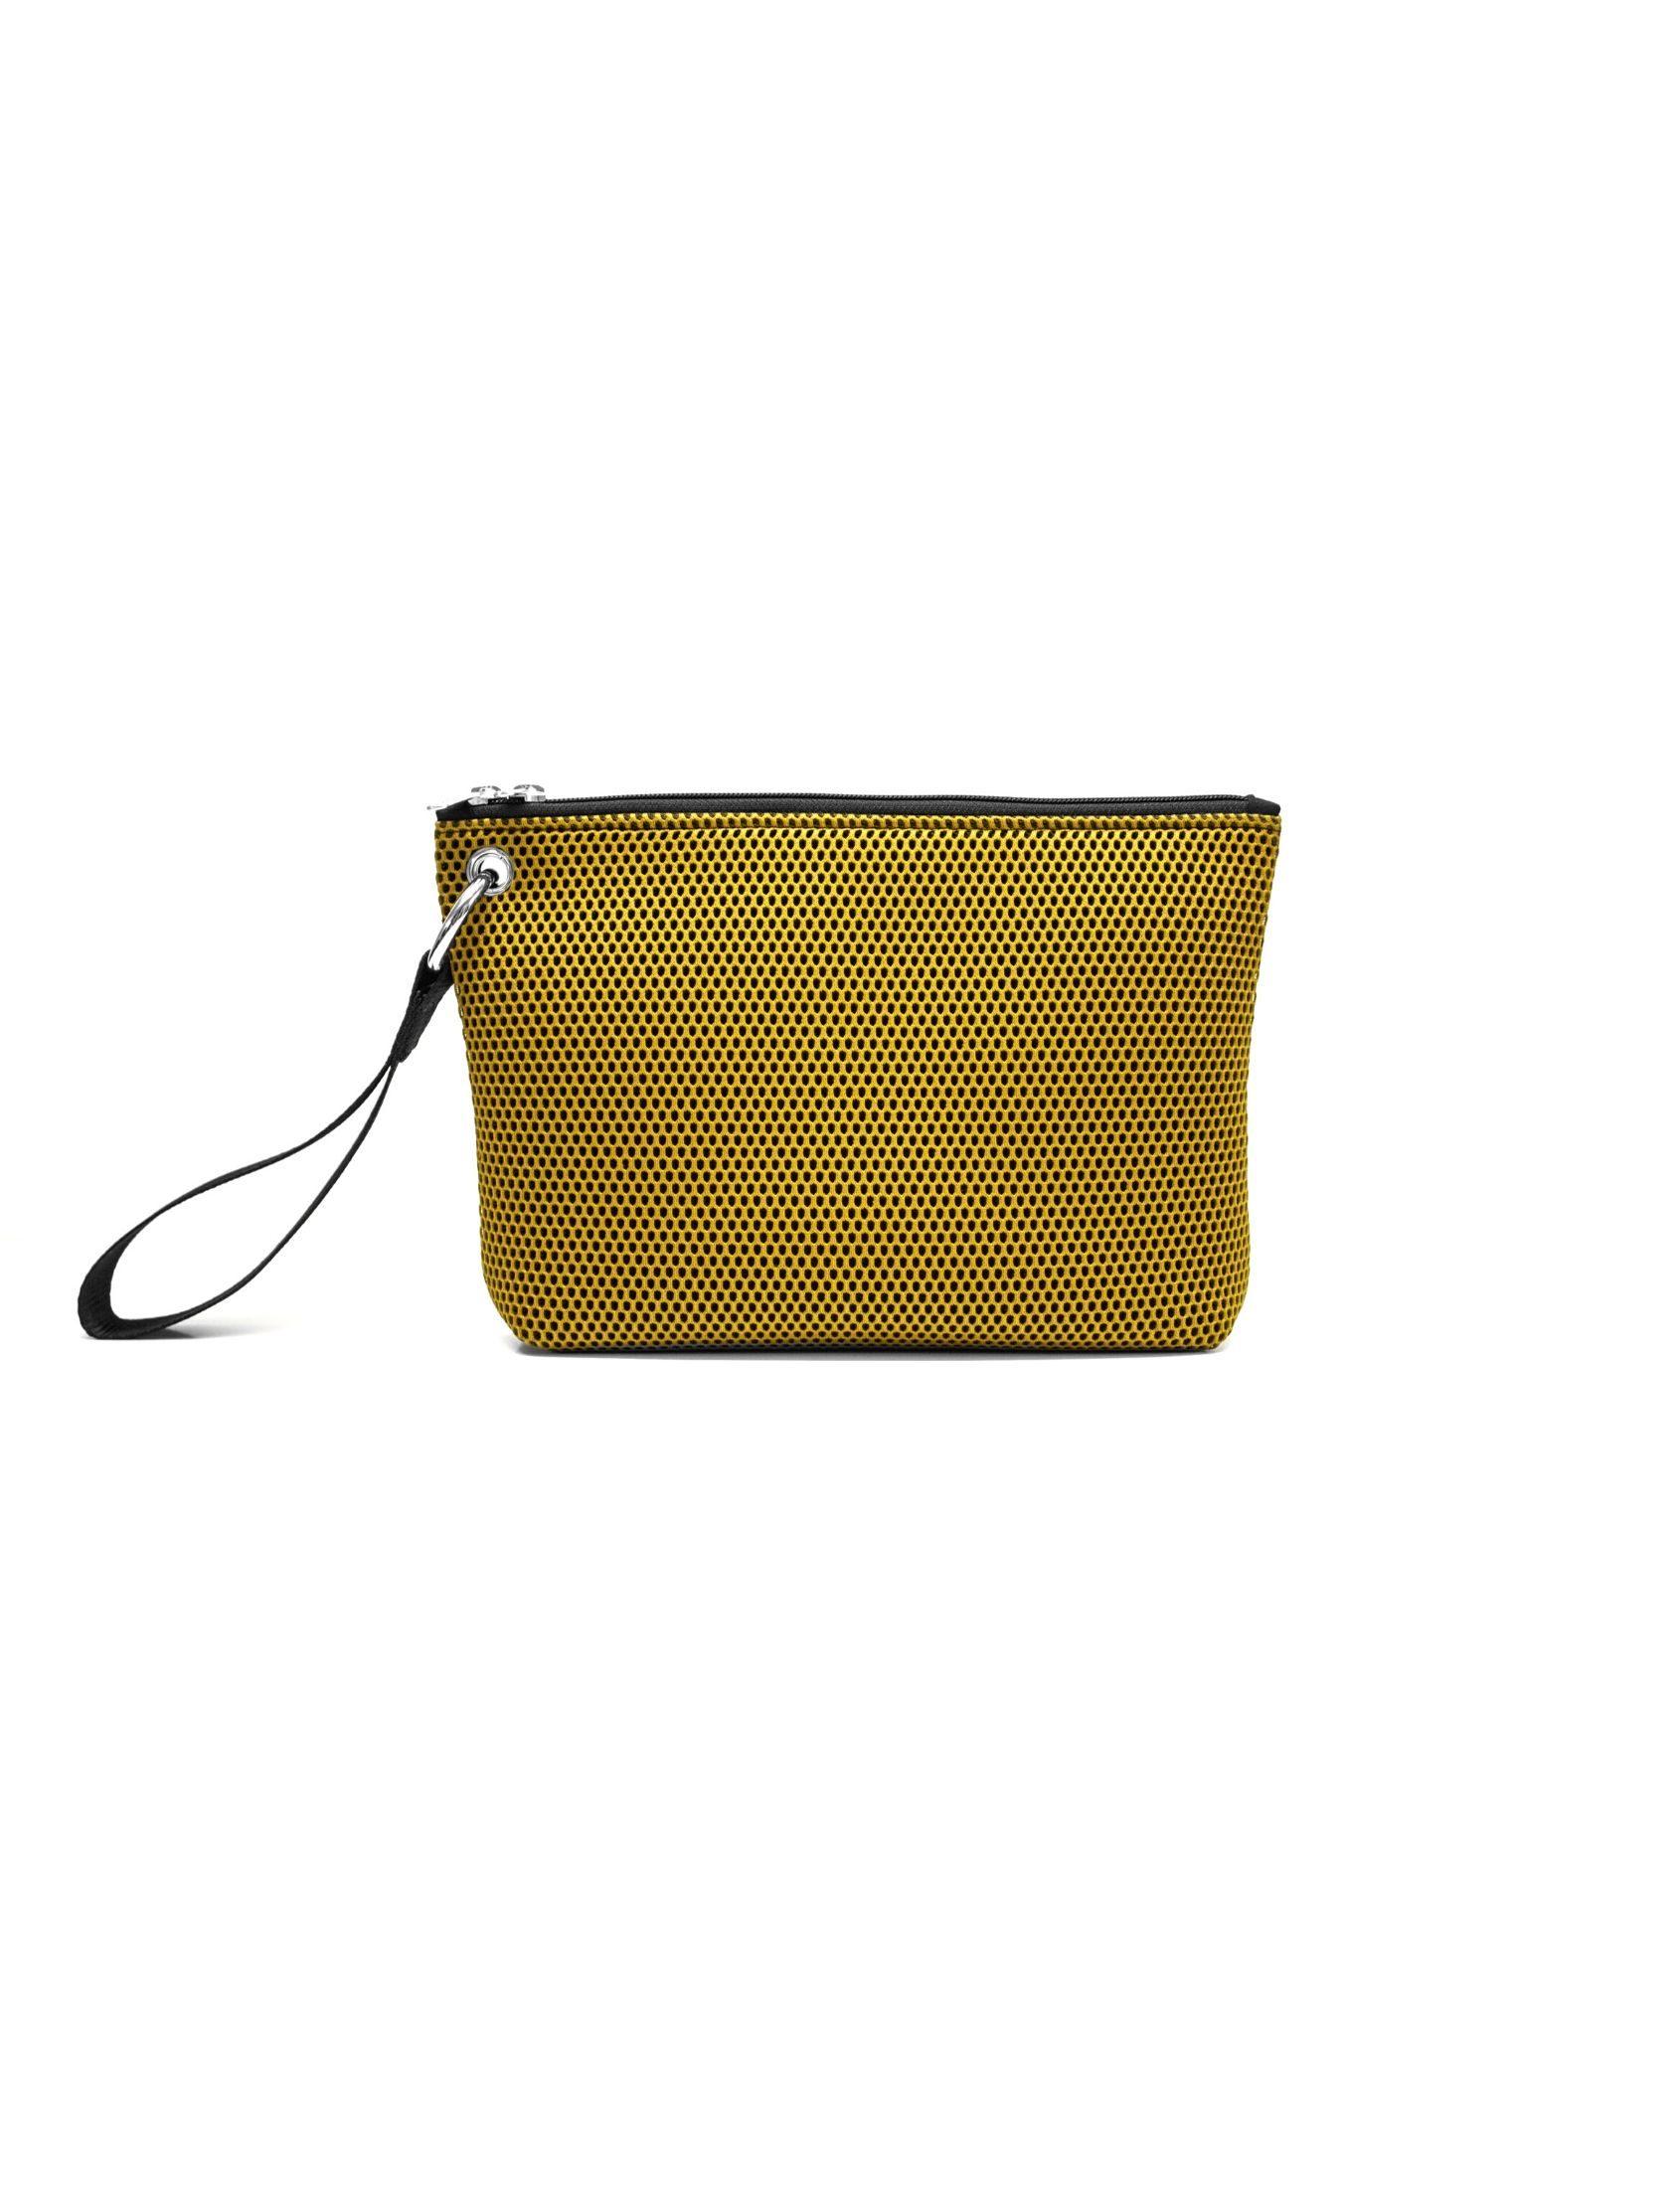 bolso de mano de Peter&Wolf con tejido ténico 3d en color verde bamboo